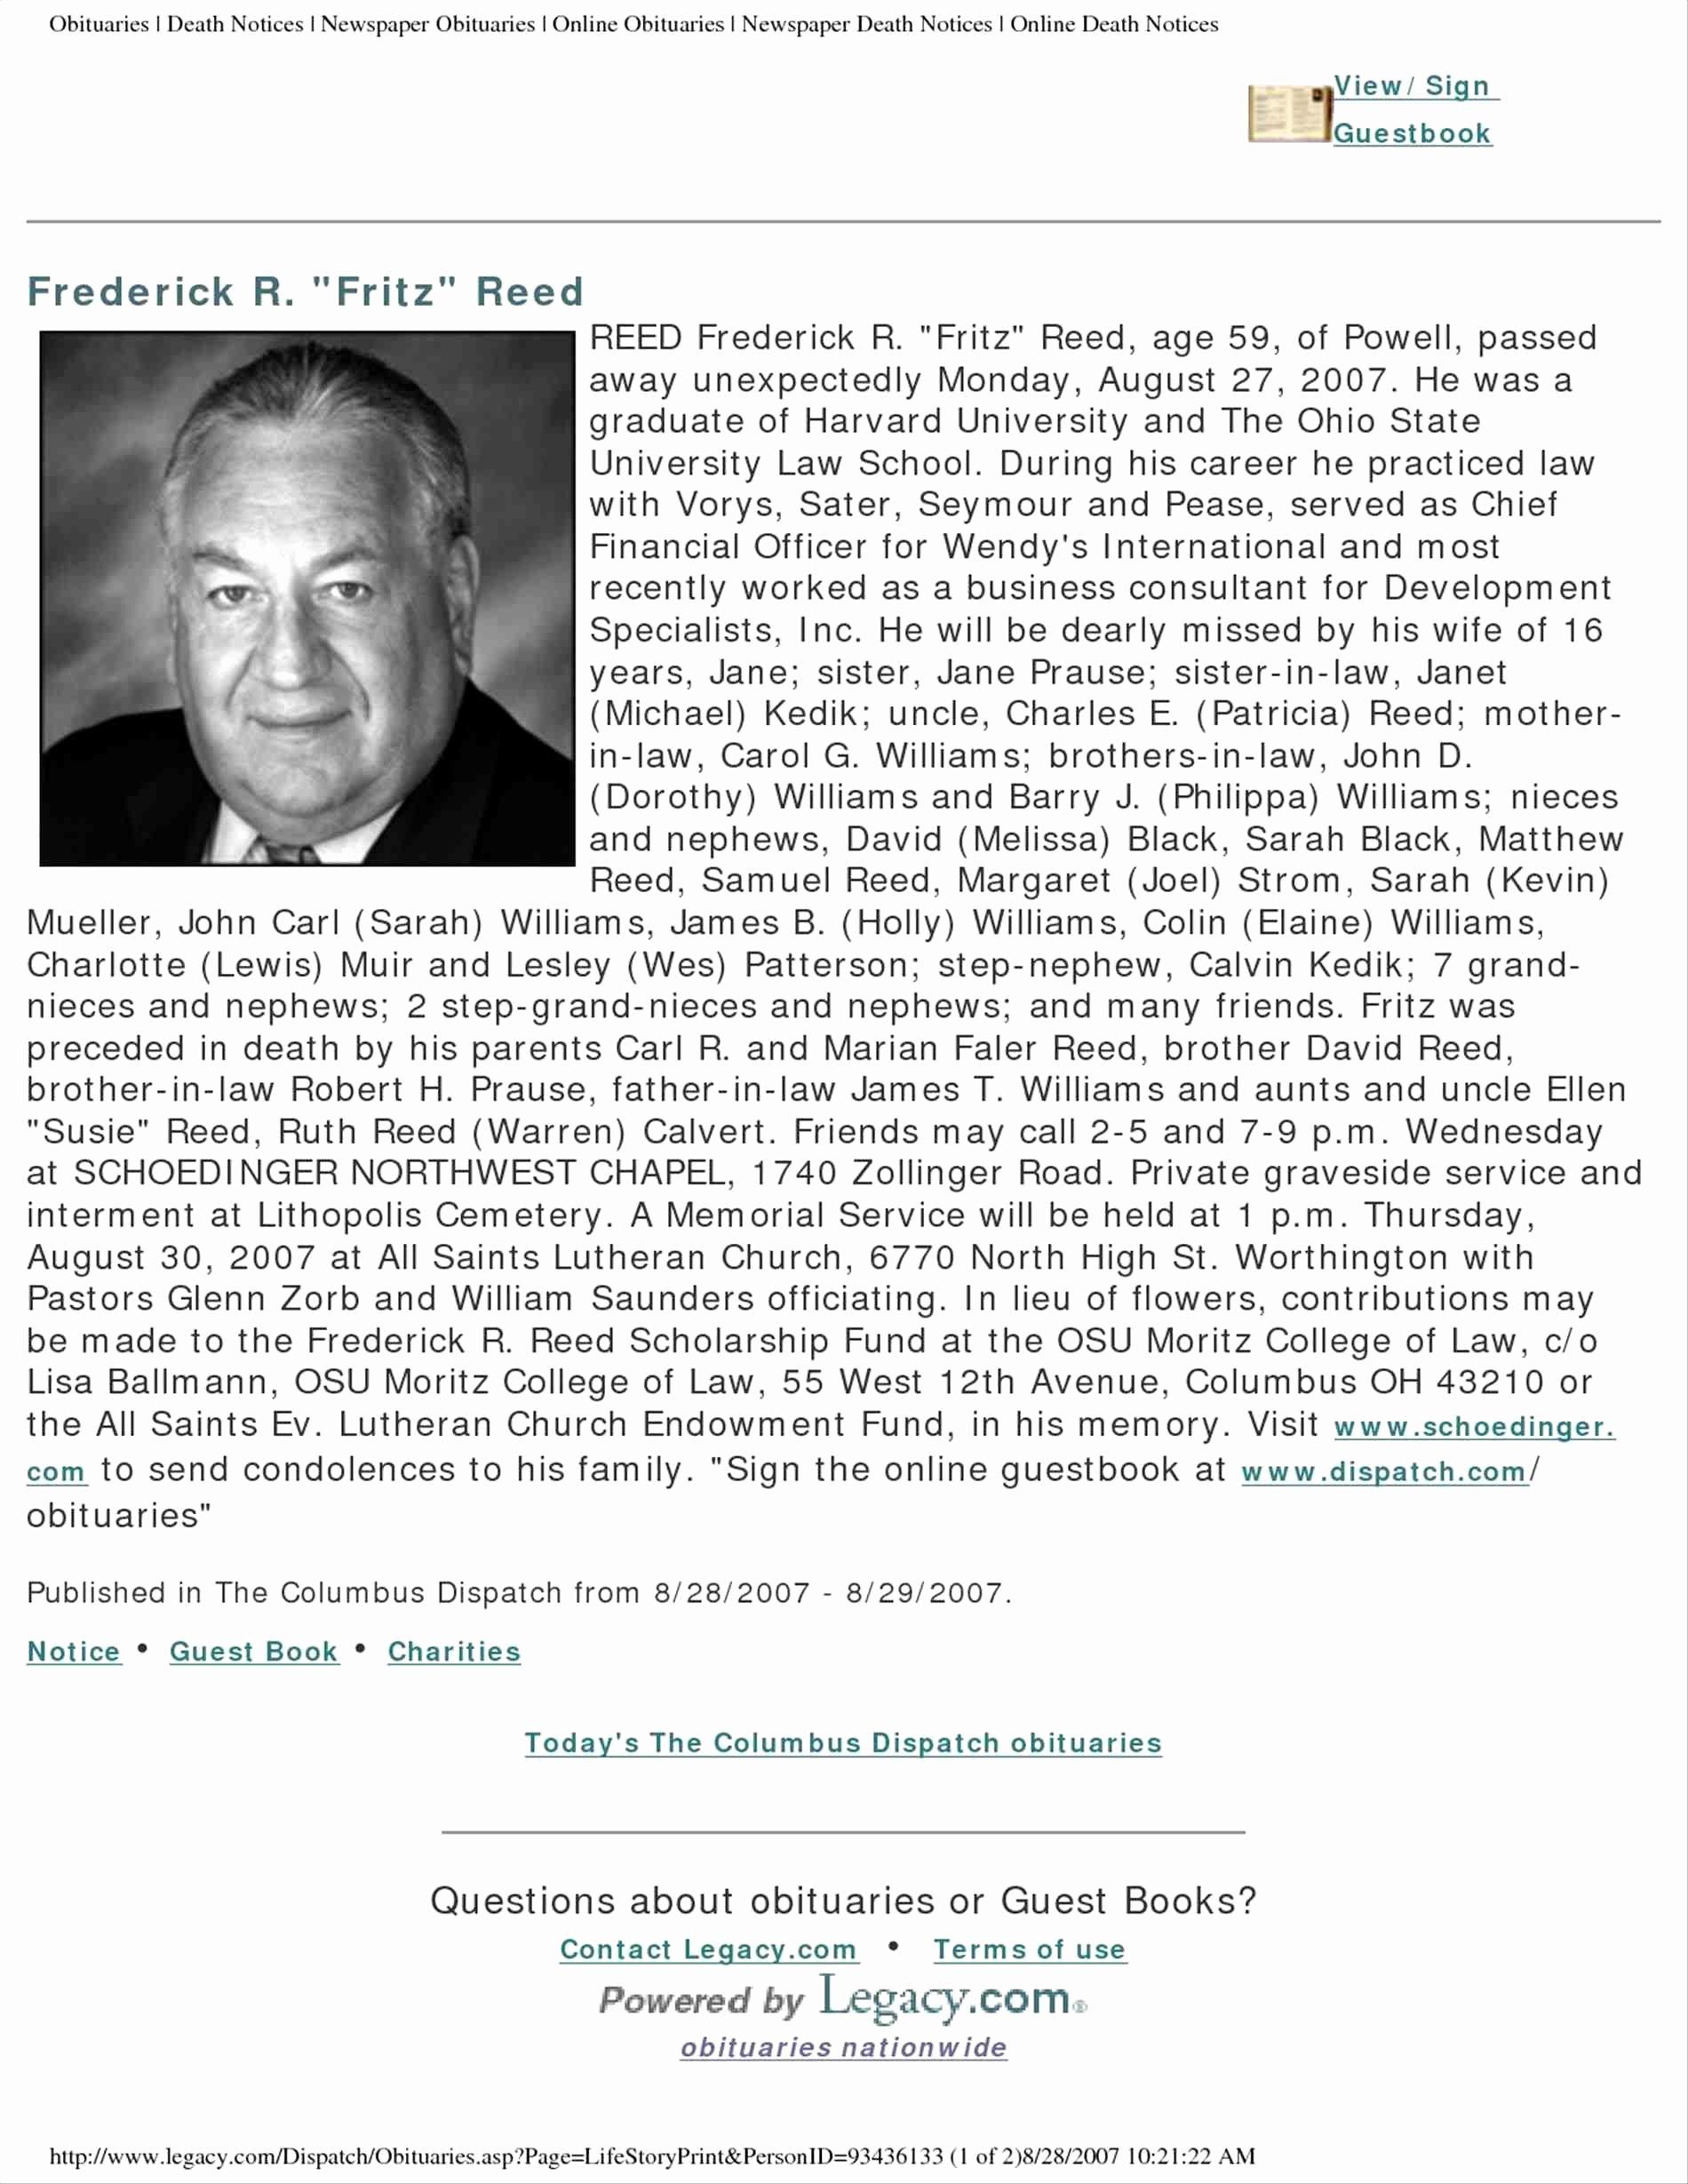 Obituary Template Google Docs Beautiful Elegant Newspaper Obituary Template Choice Image Template